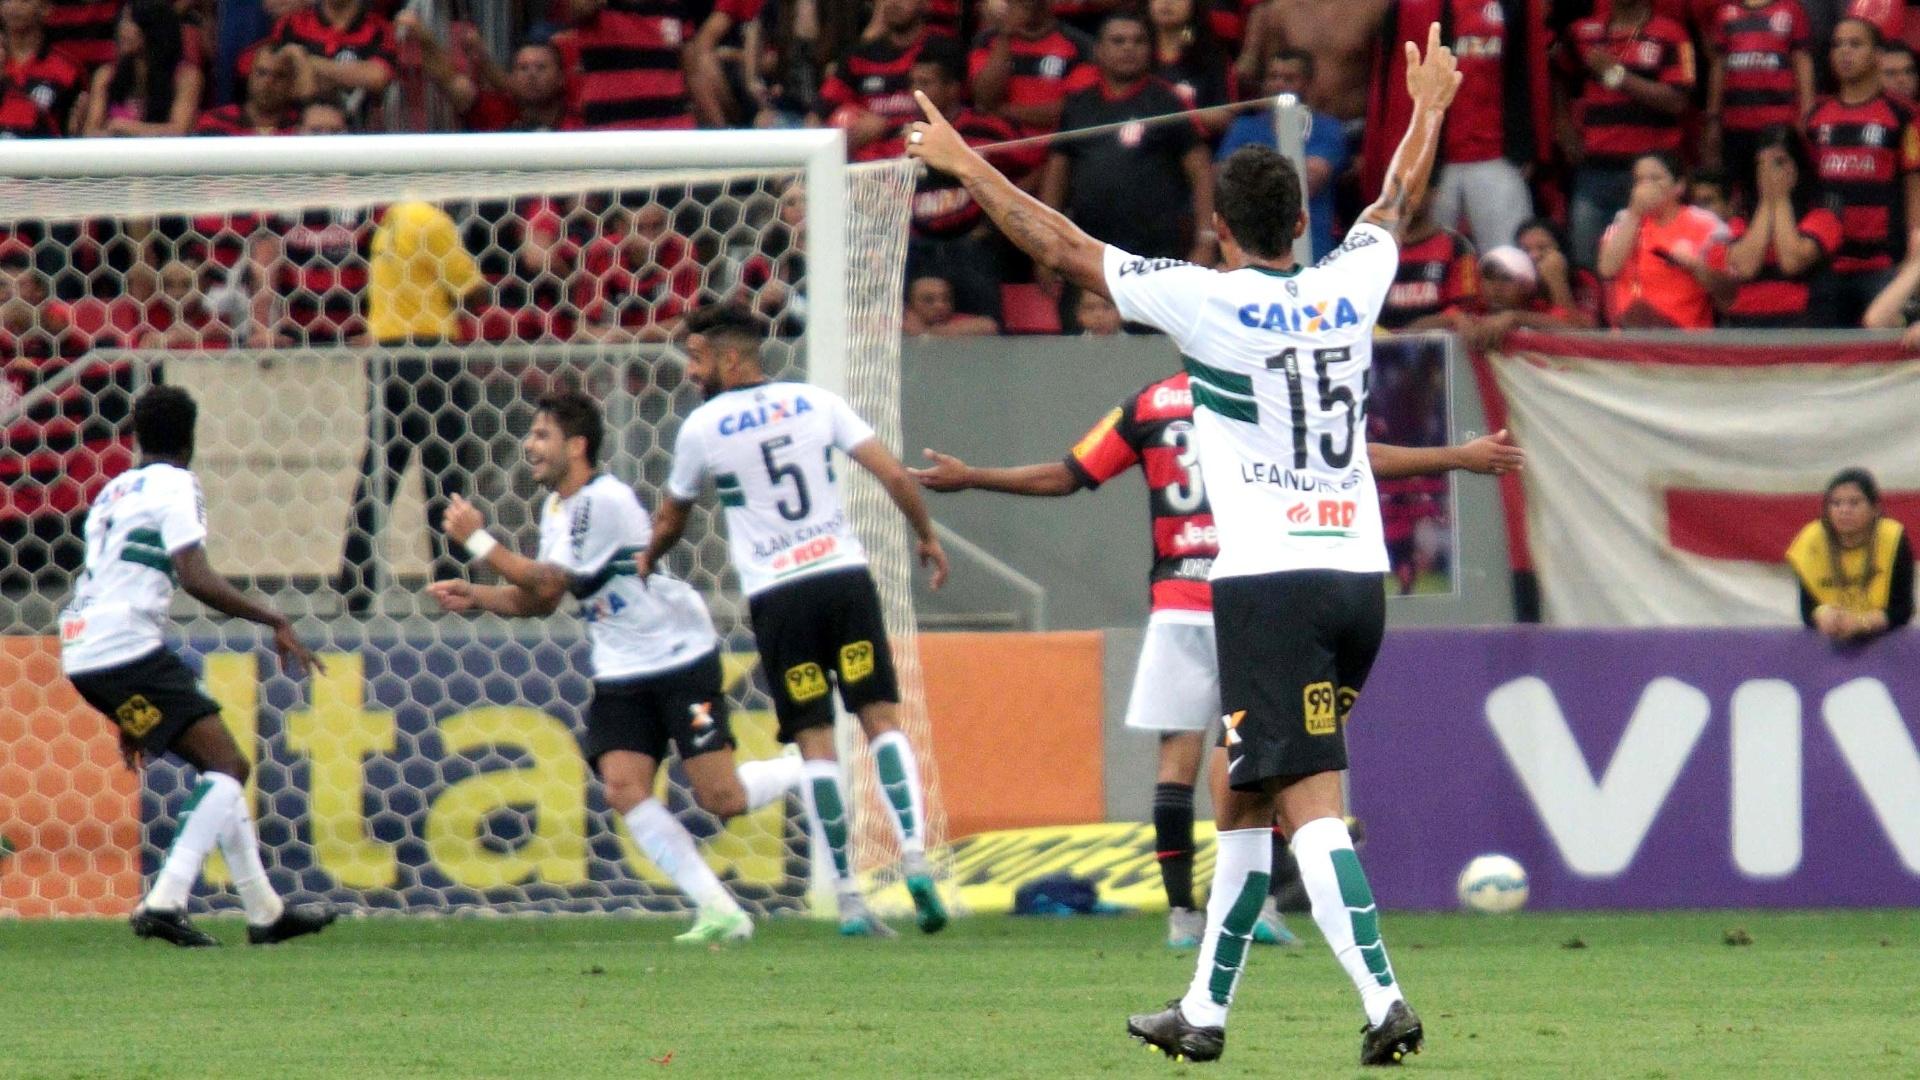 Jogadores do Coritiba comemoram gol de Kleber contra o Flamengo, no Mané Garrincha